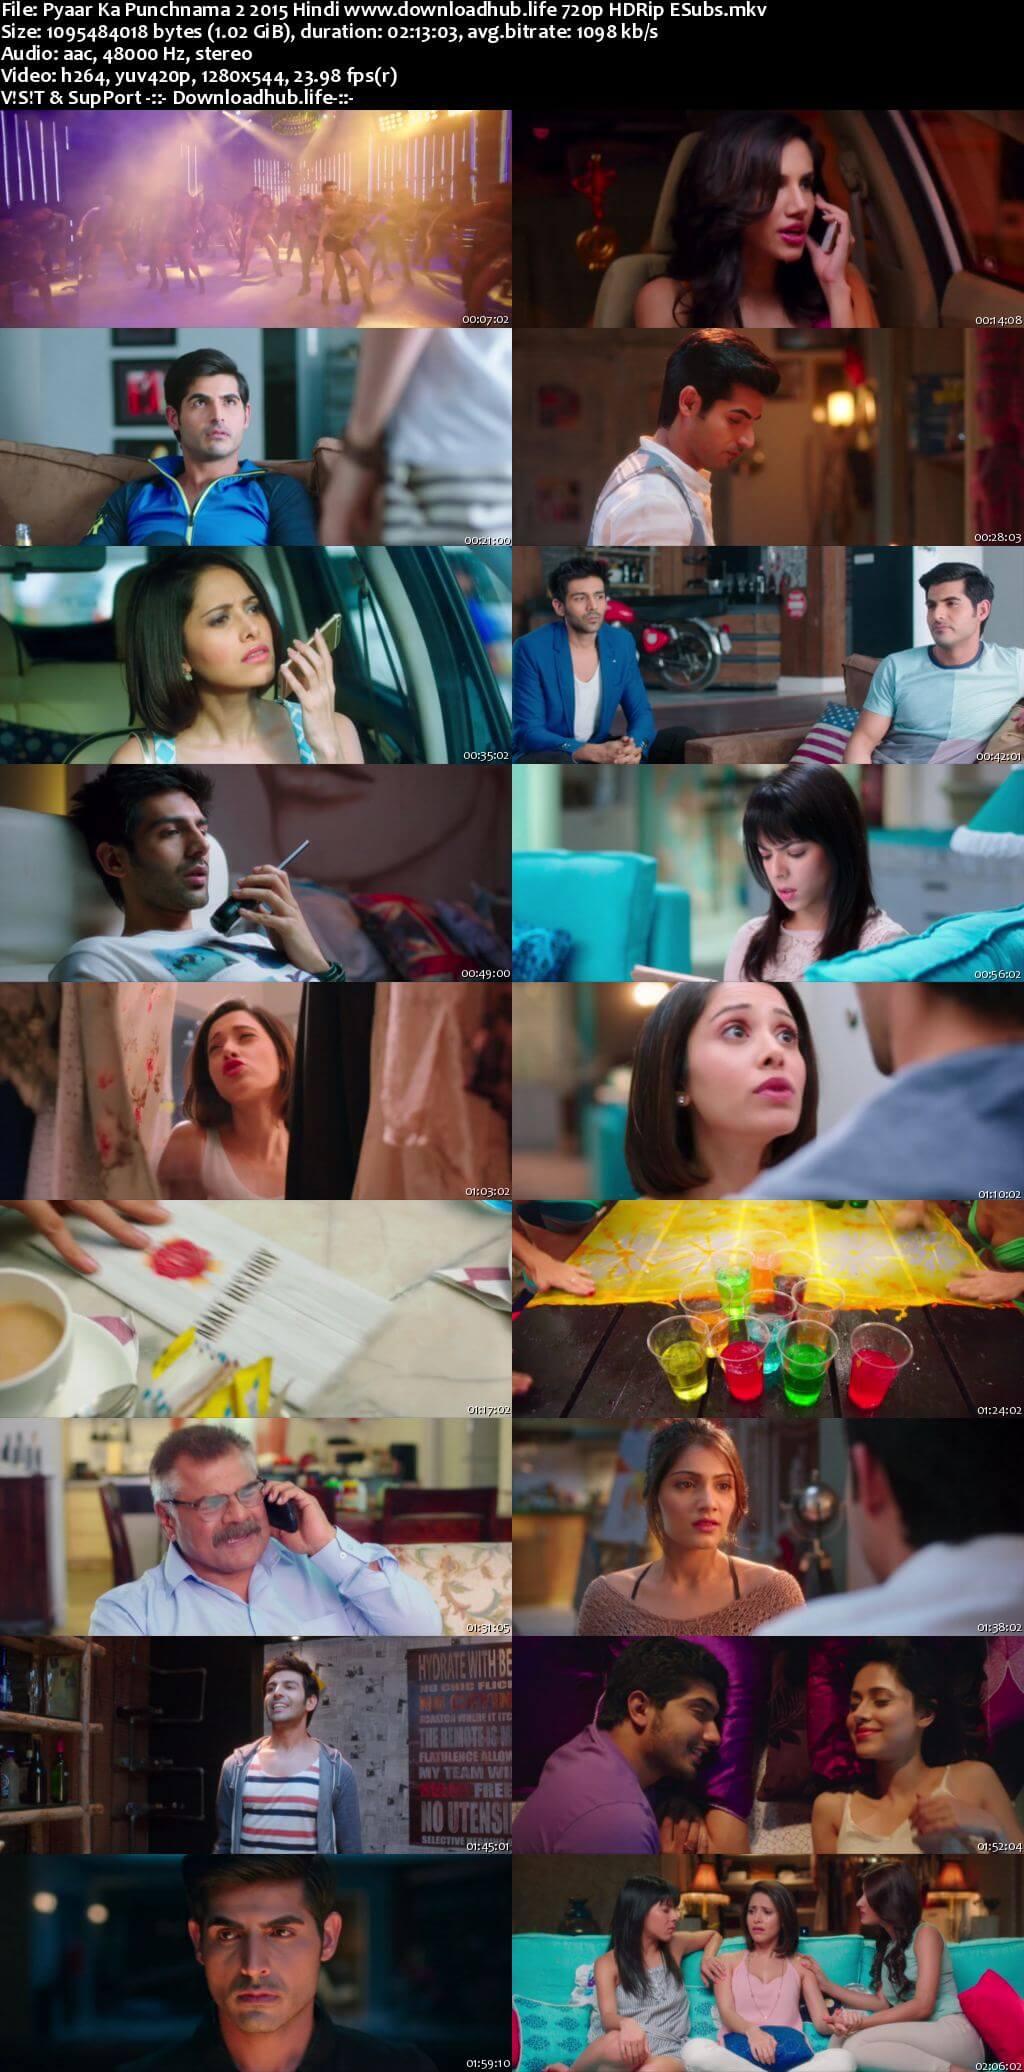 Pyaar Ka Punchnama 2 2015 Hindi 720p HDRip ESubs